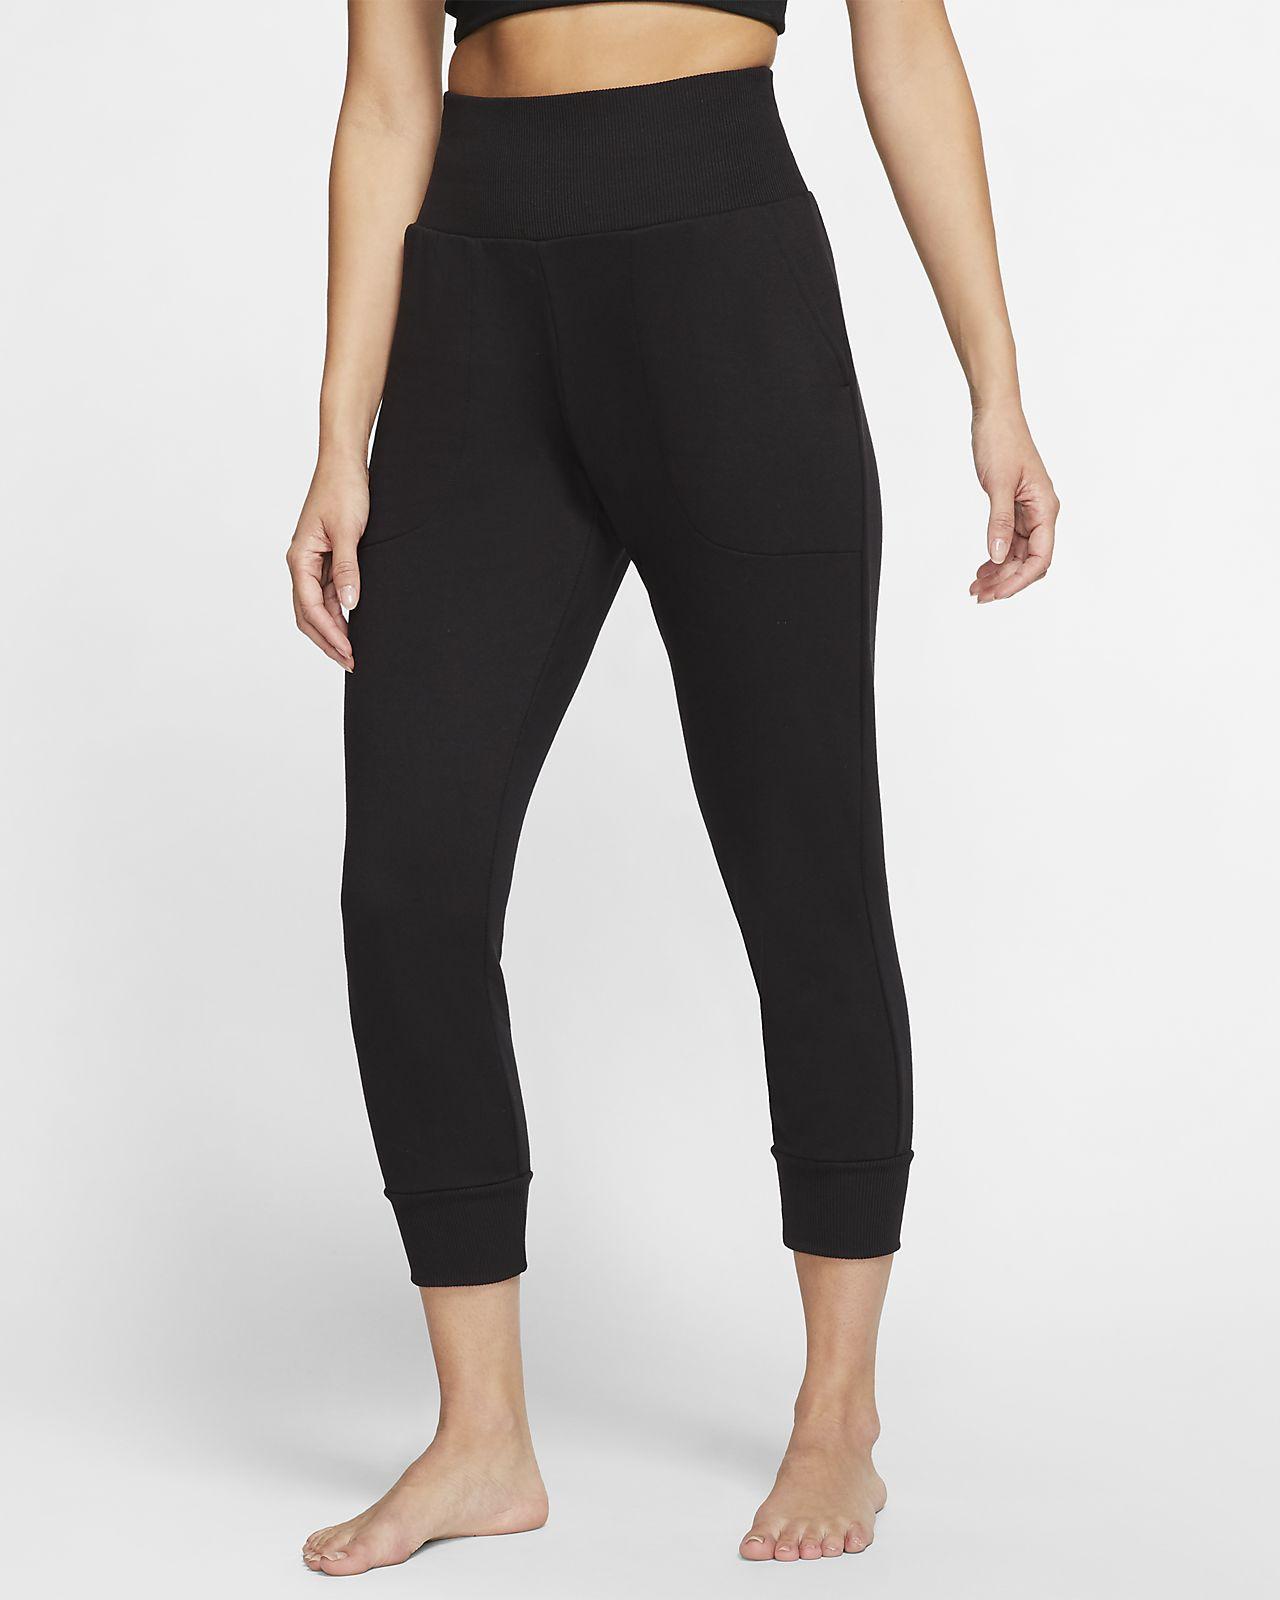 Nike Yoga Damenhose